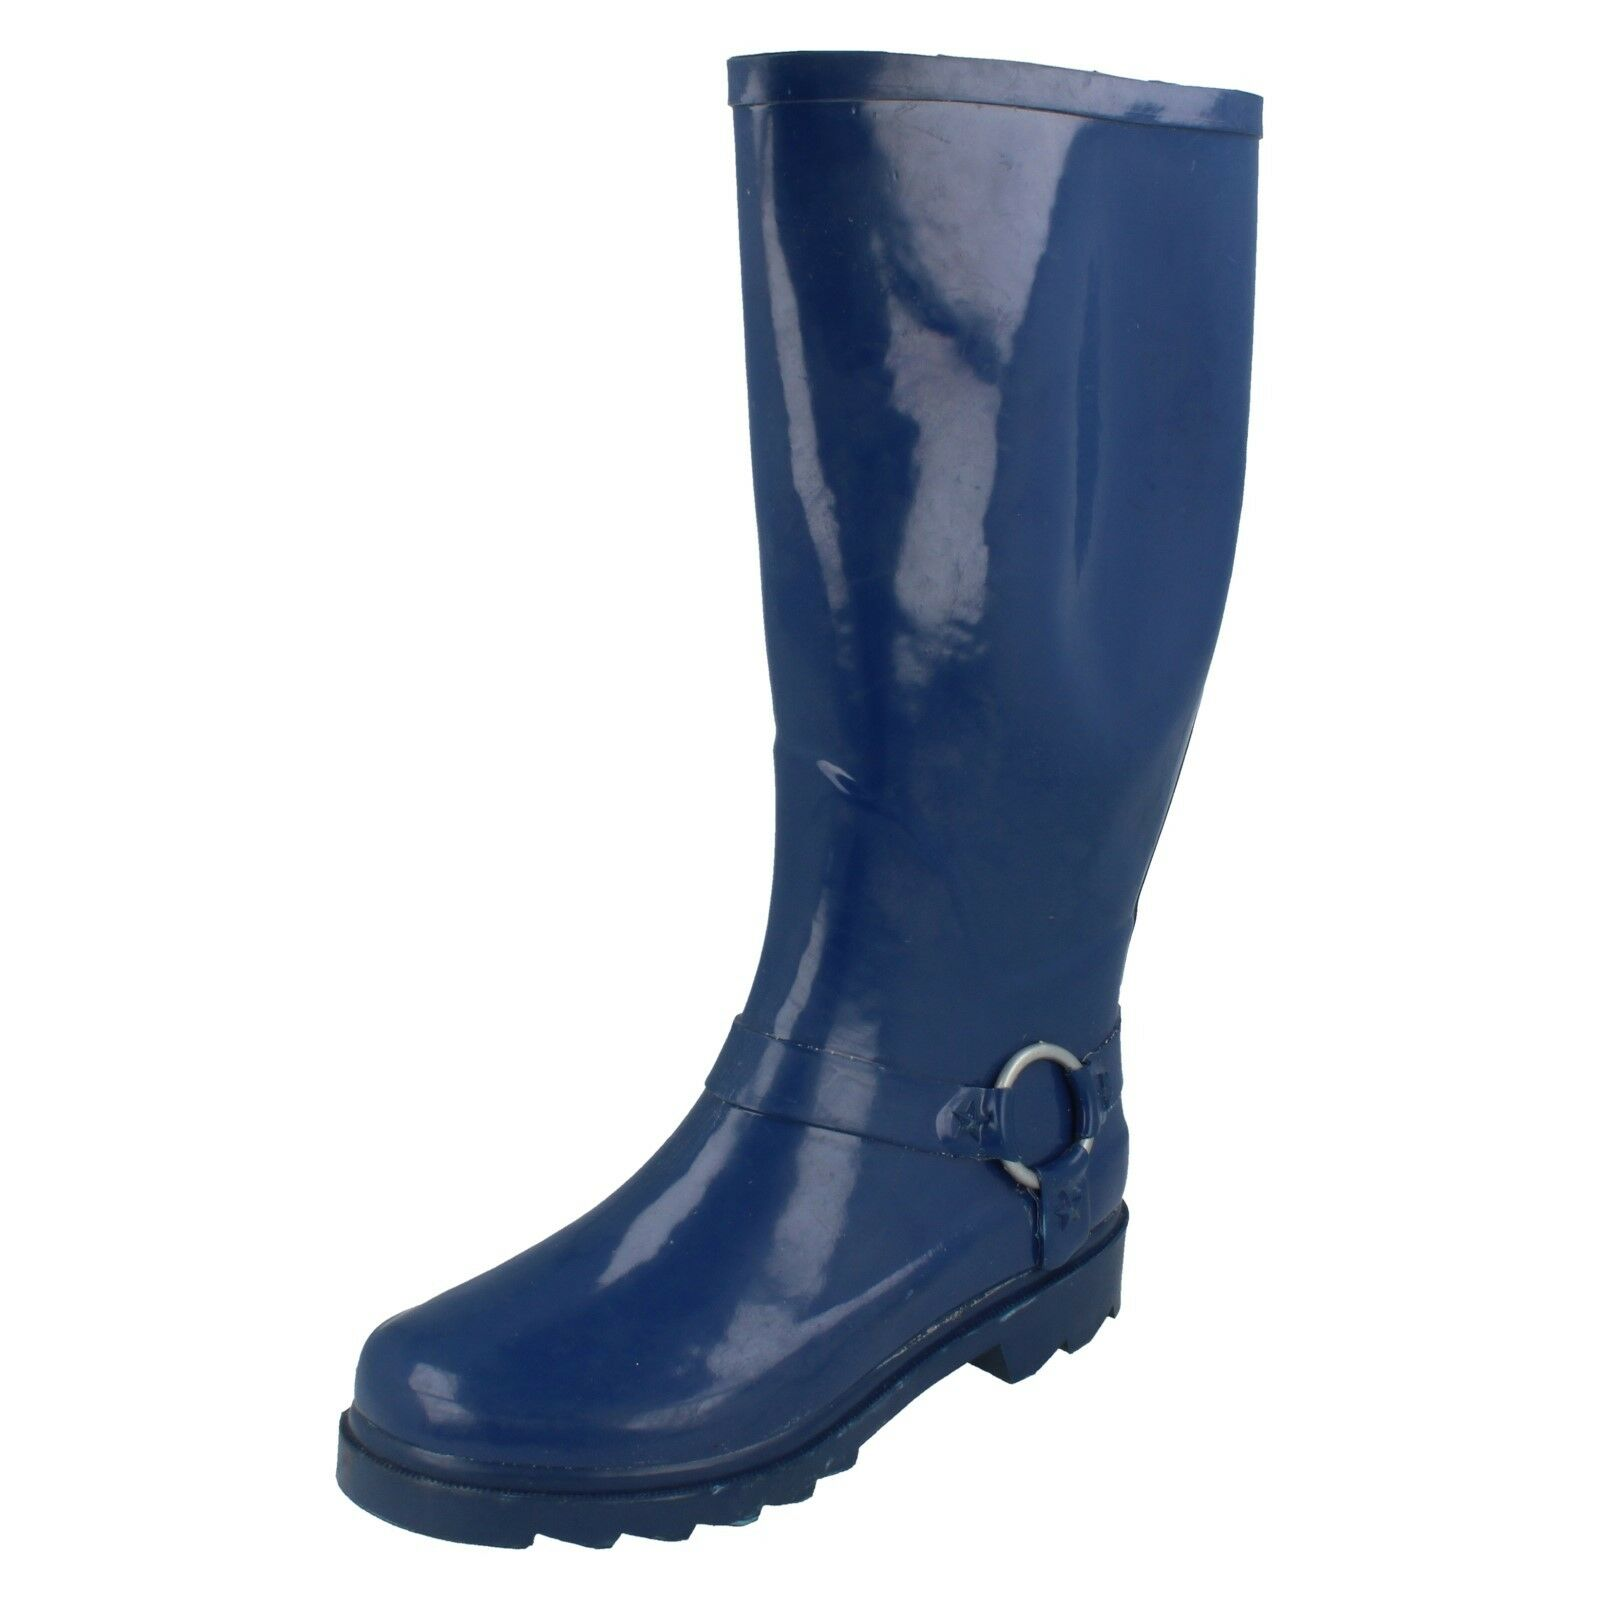 Ladies Wellington boots blue rubber with decorative heel X1031 SALE